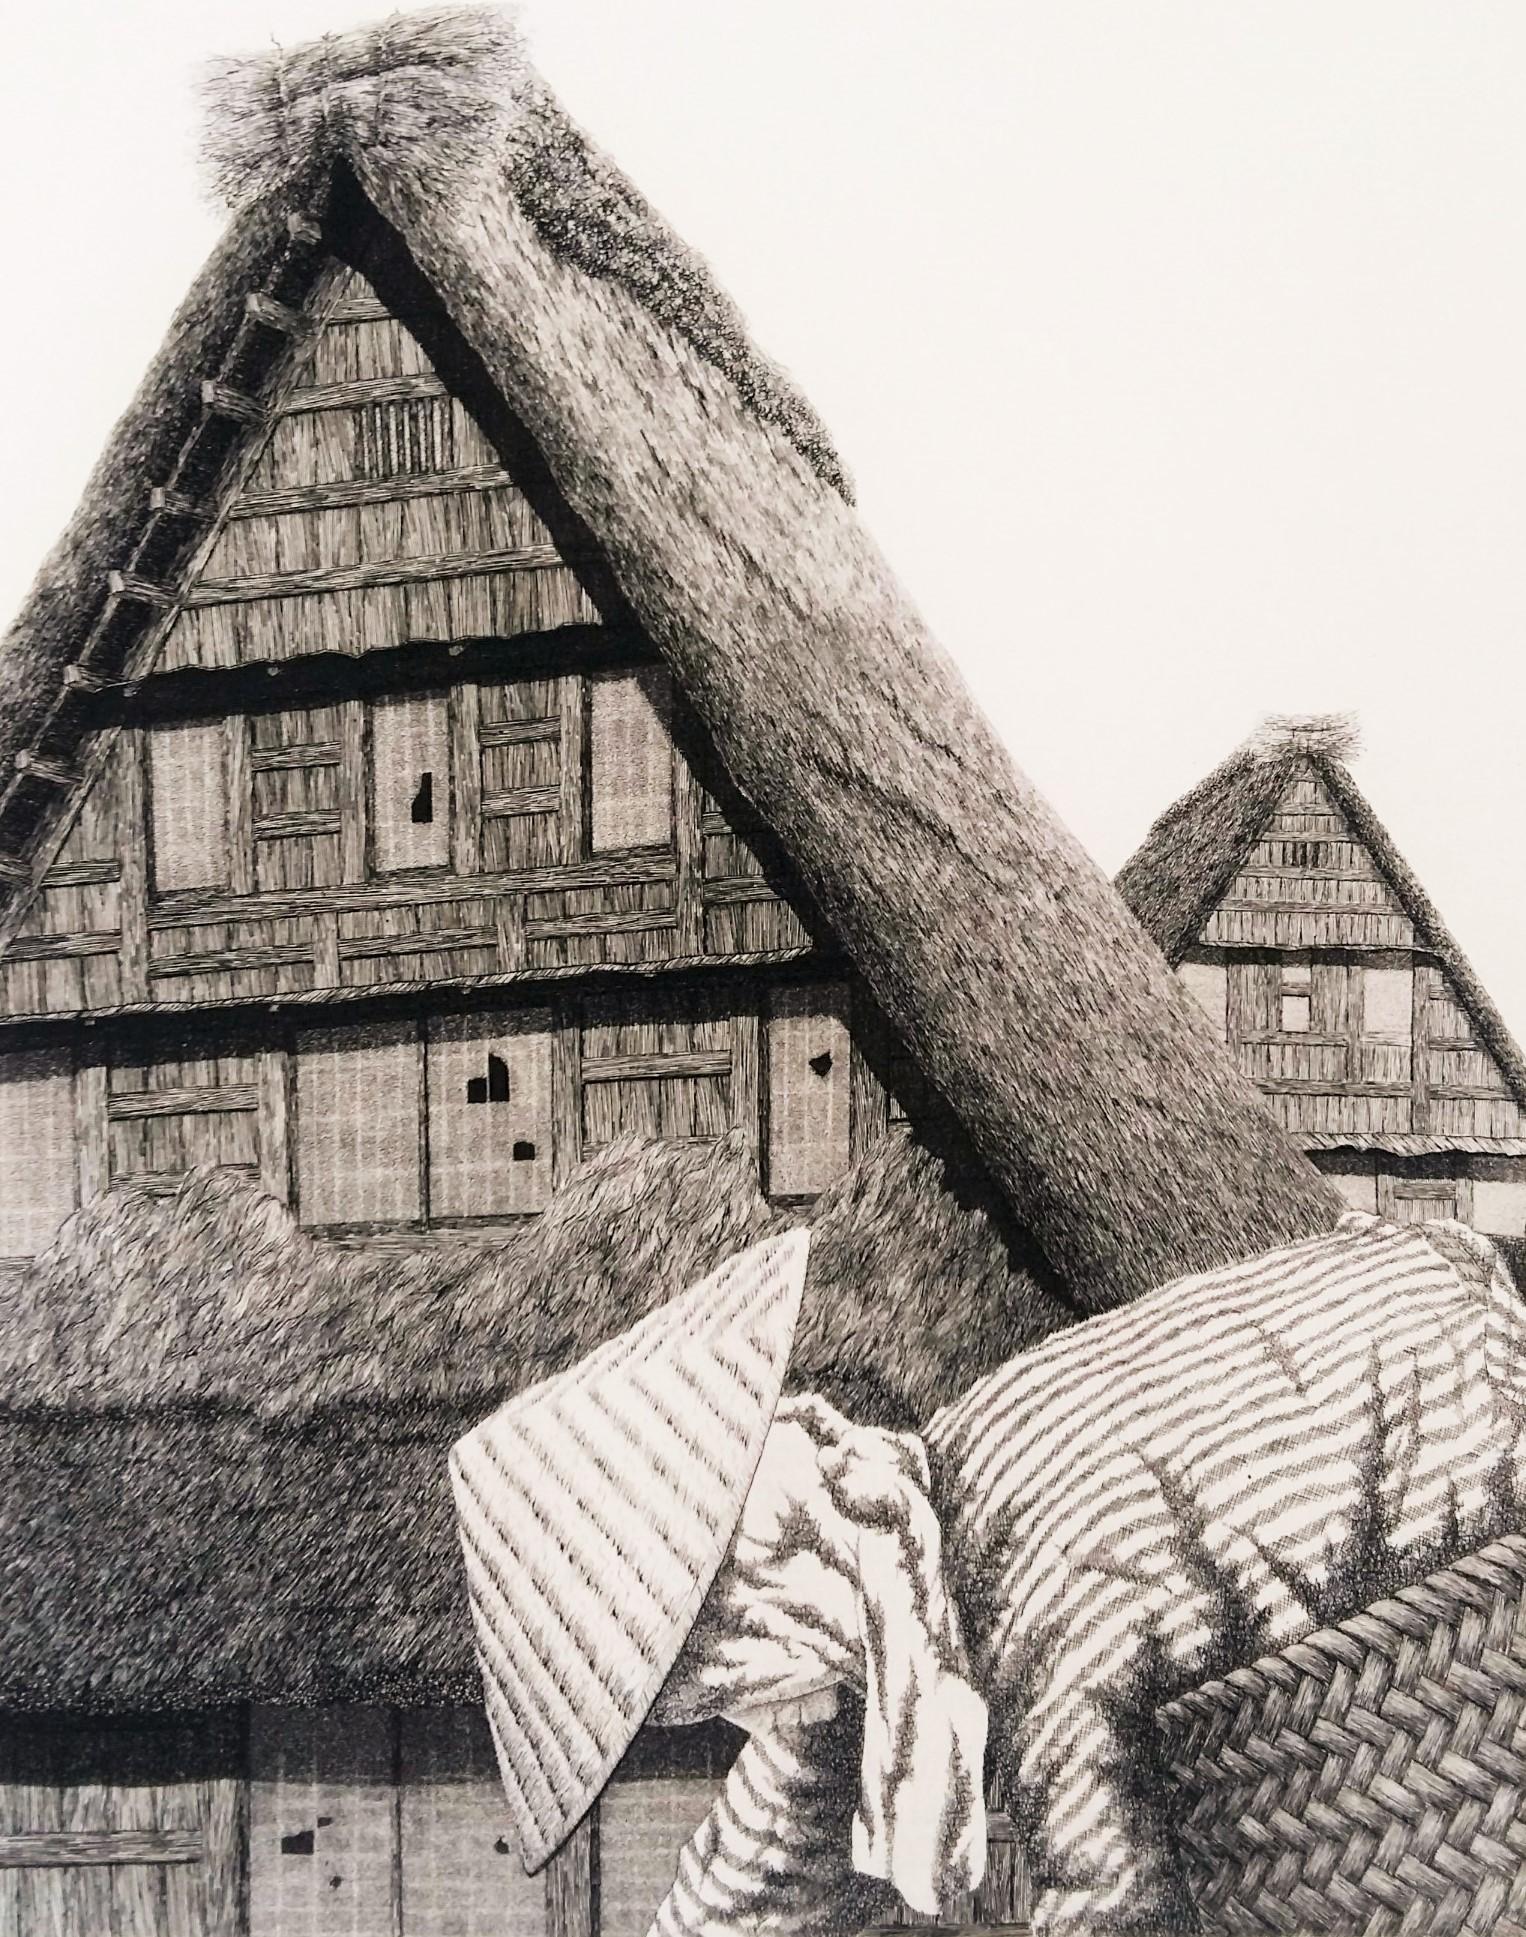 Tanaka Ryohei TR 133.Roofs of Hida 5. 1974. 30 x 24 cm. Ed 100. (2)